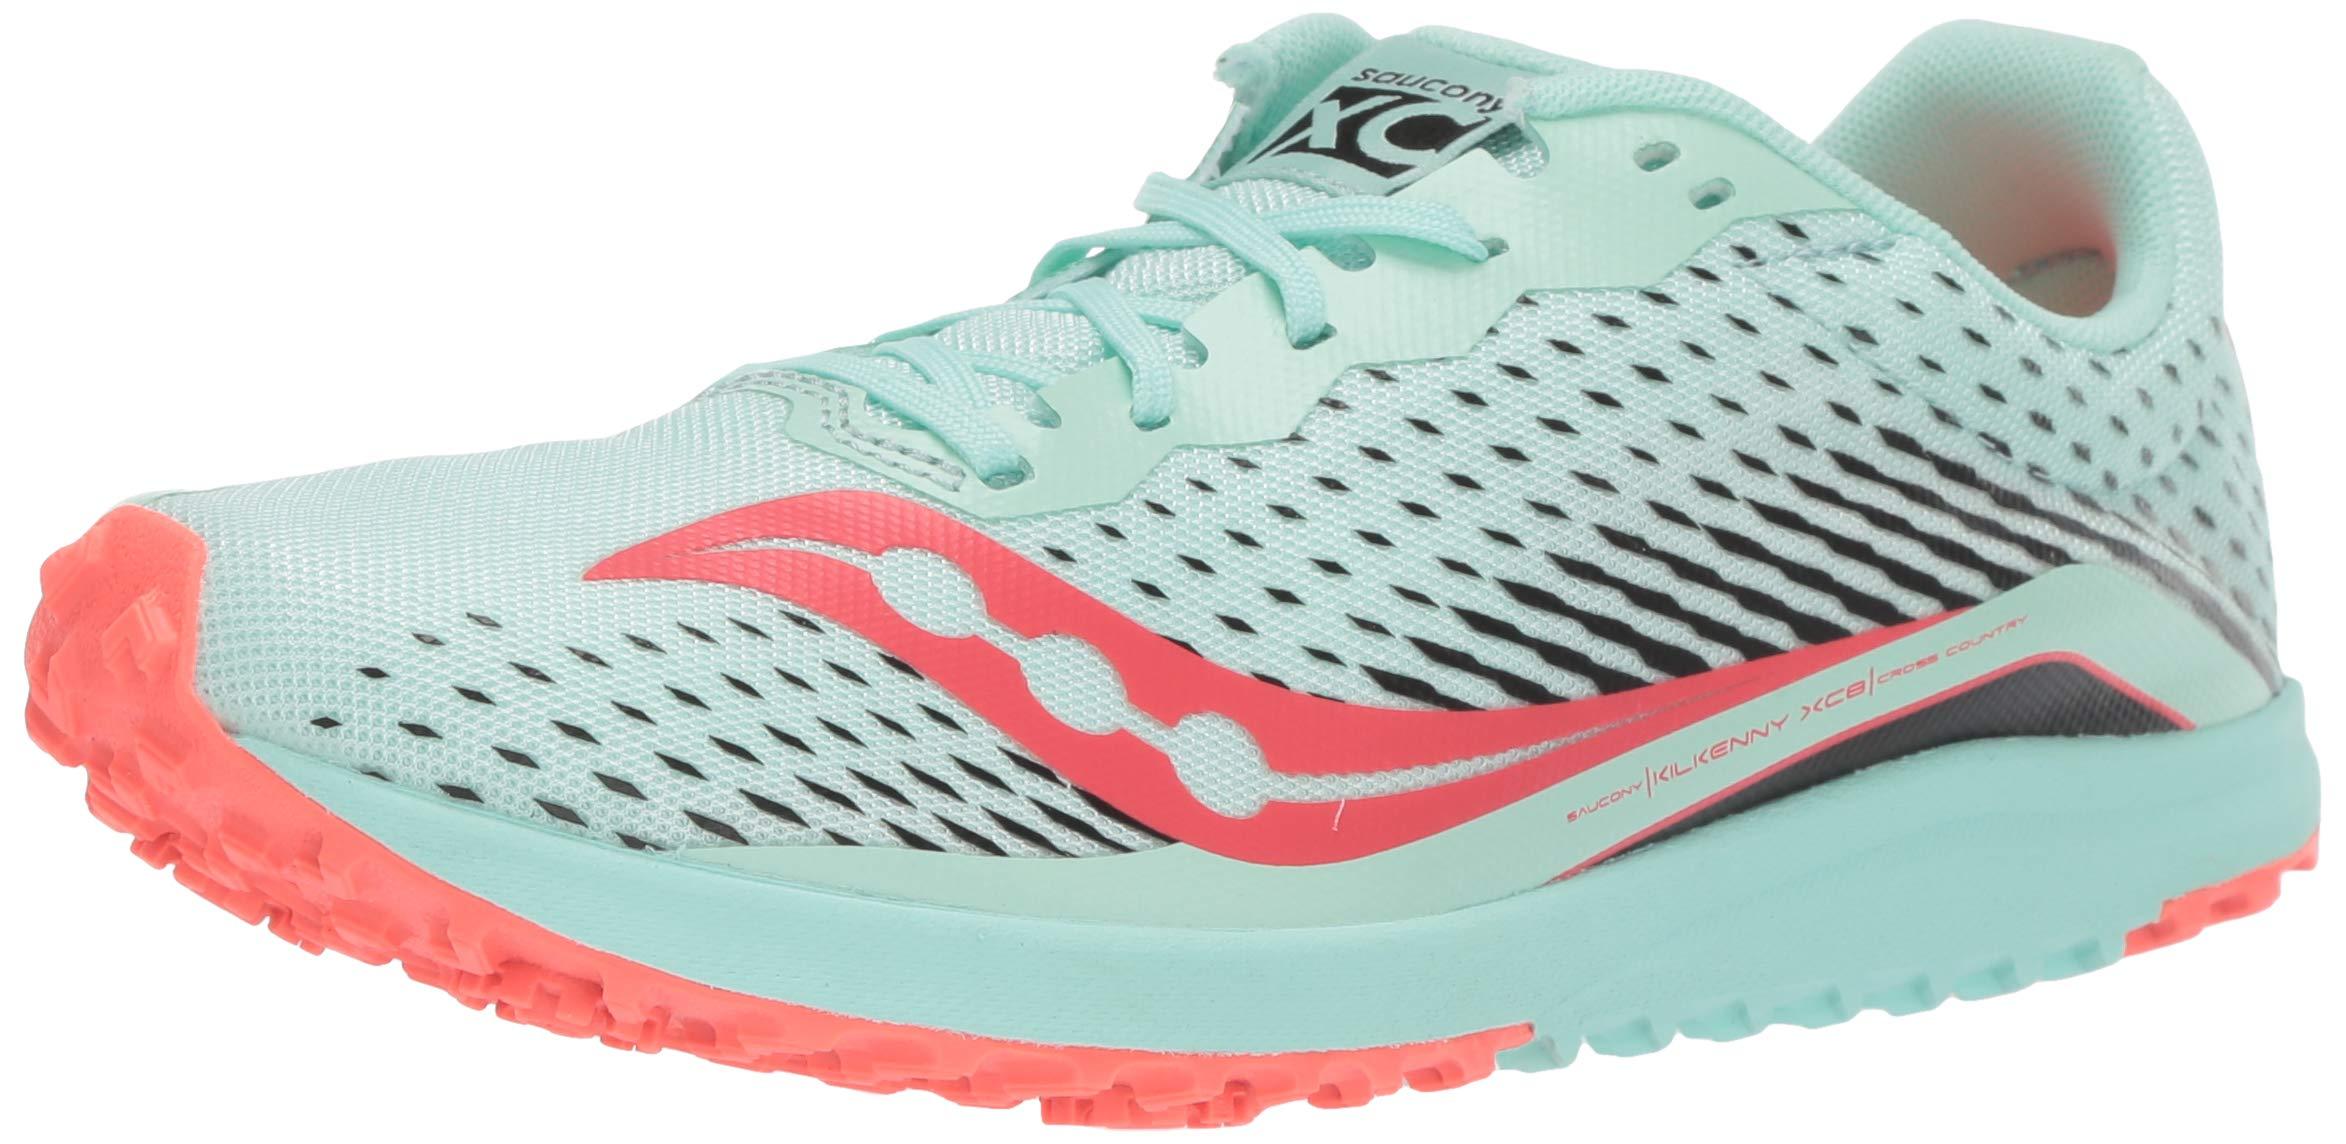 Saucony Women's Kilkenny XC8 Flat Track Shoe, Mint/Vizi Coral, 5.5 Medium US